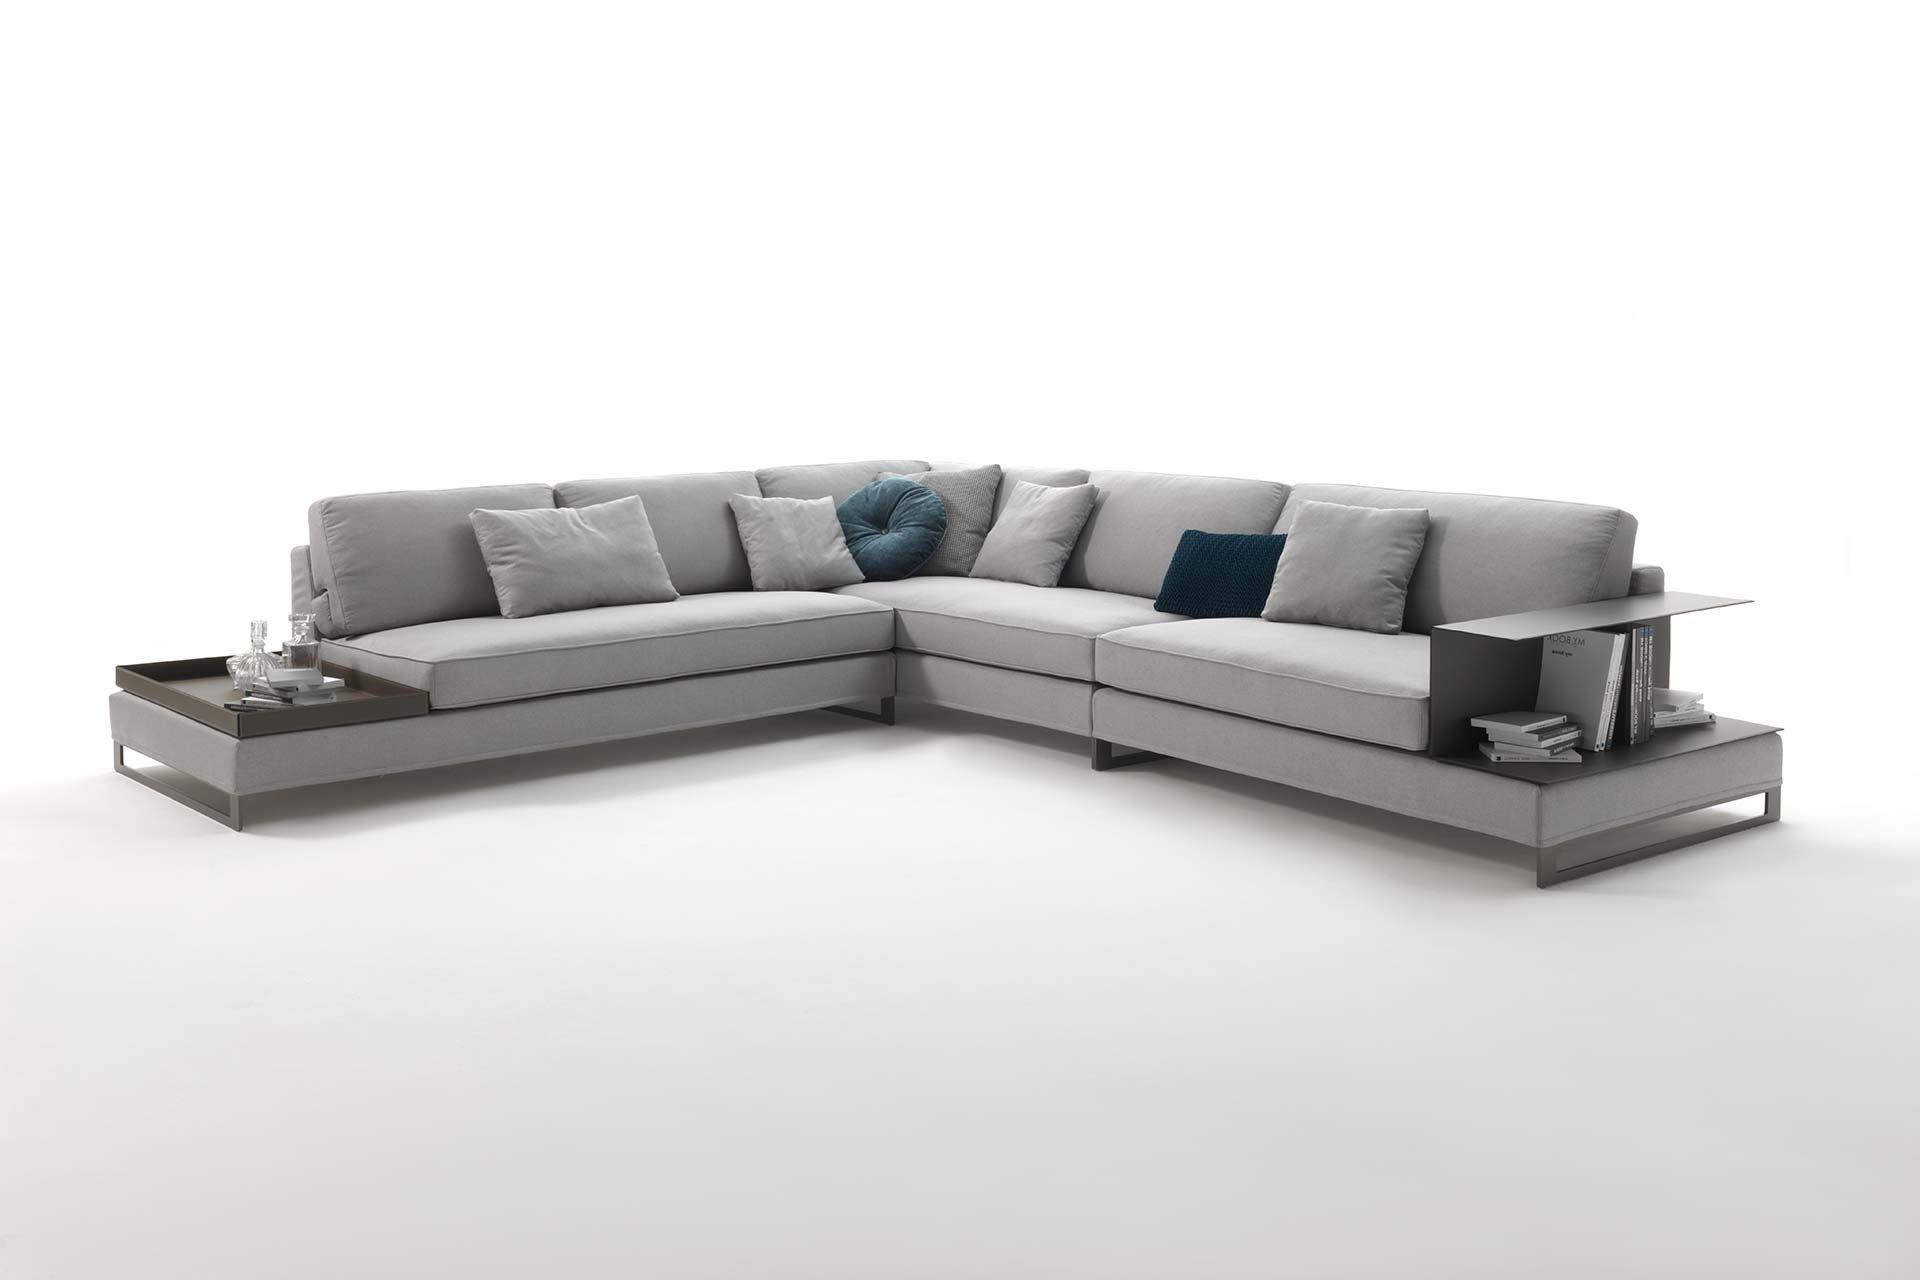 Preferred Modular Sofa / Contemporary / Fabric / Leather – Davis Case With Contemporary Fabric Sofas (View 16 of 20)